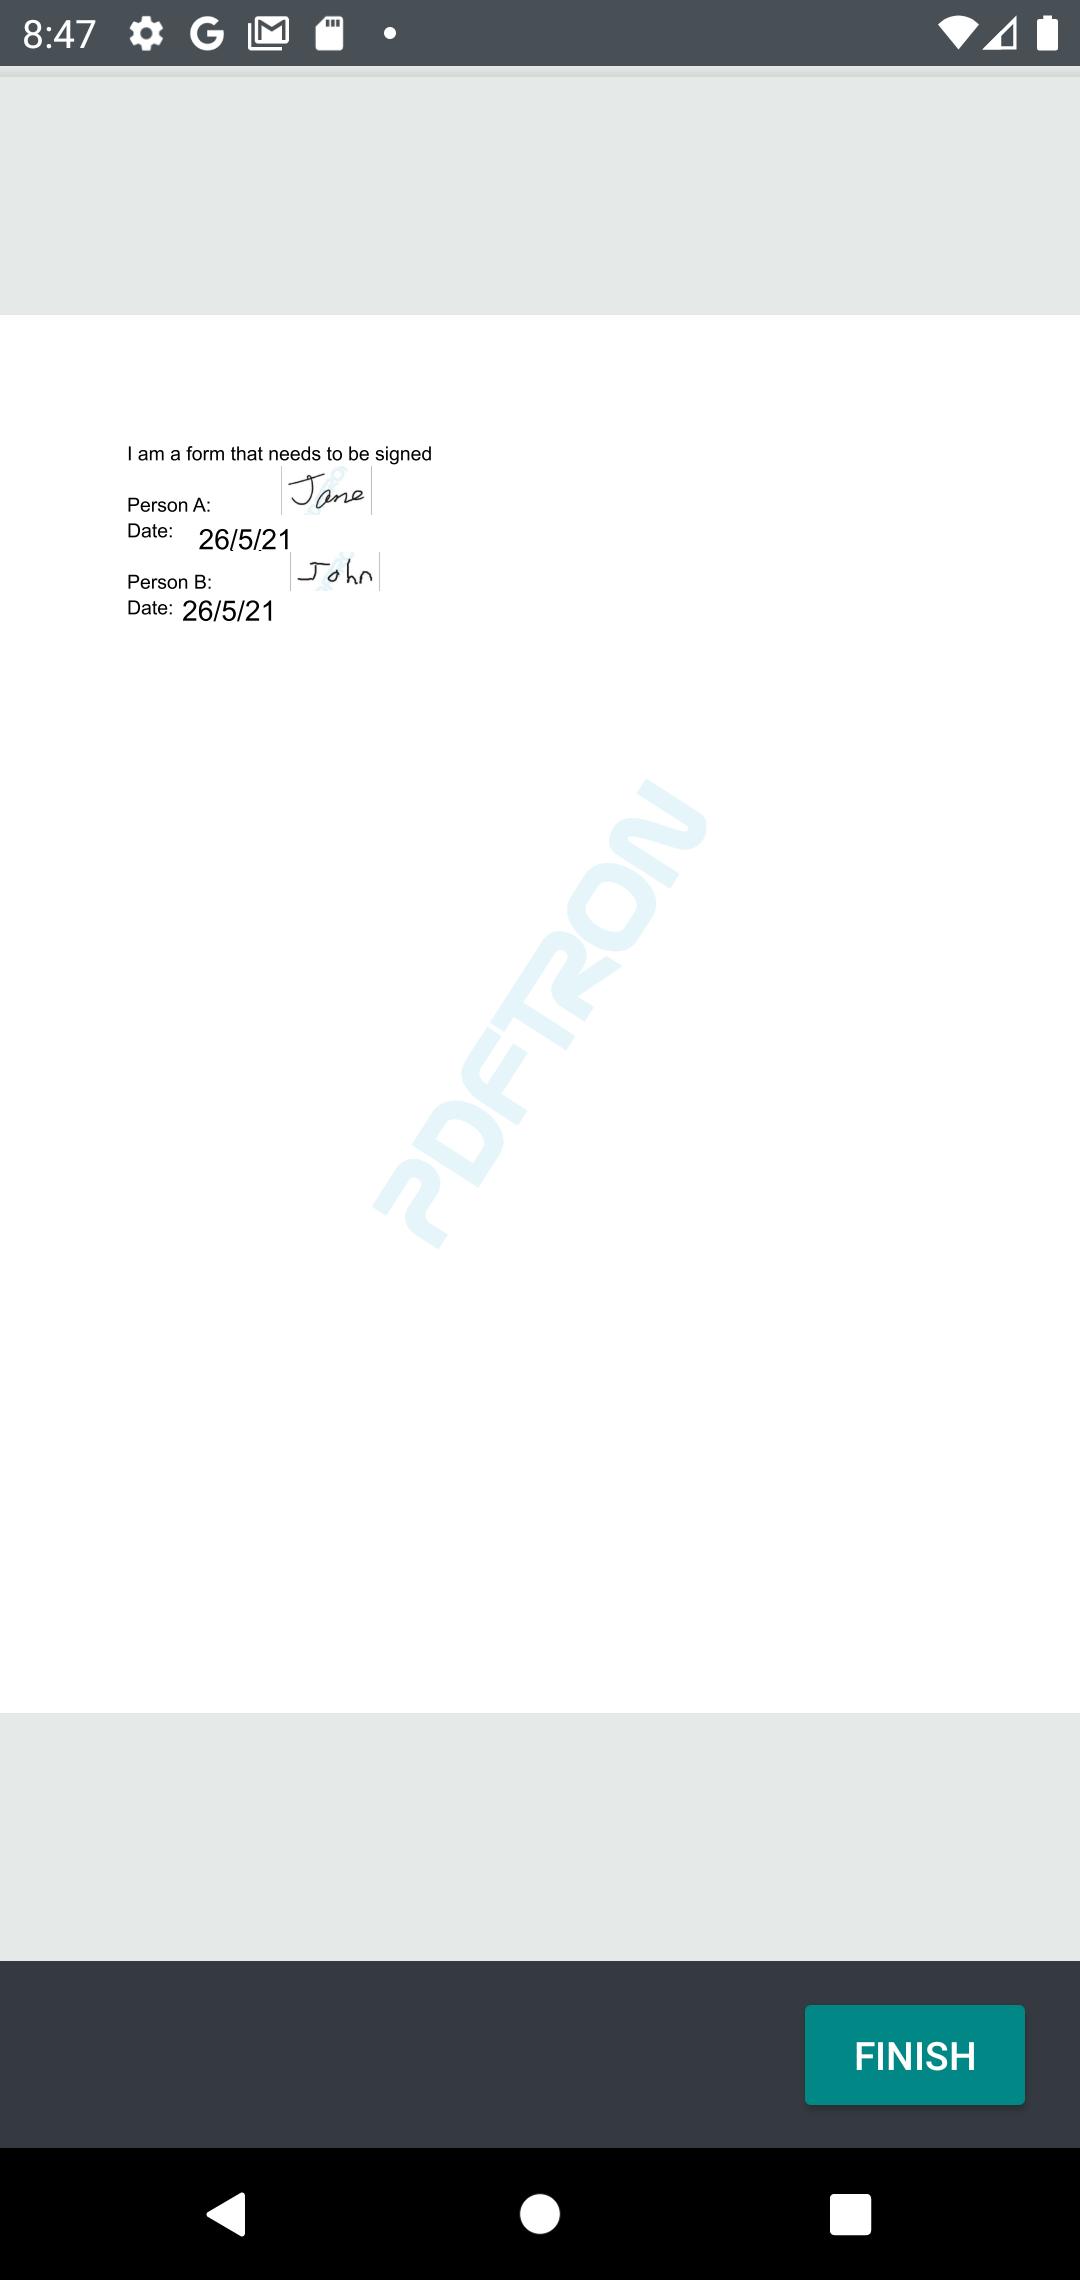 PDFTron Signing App